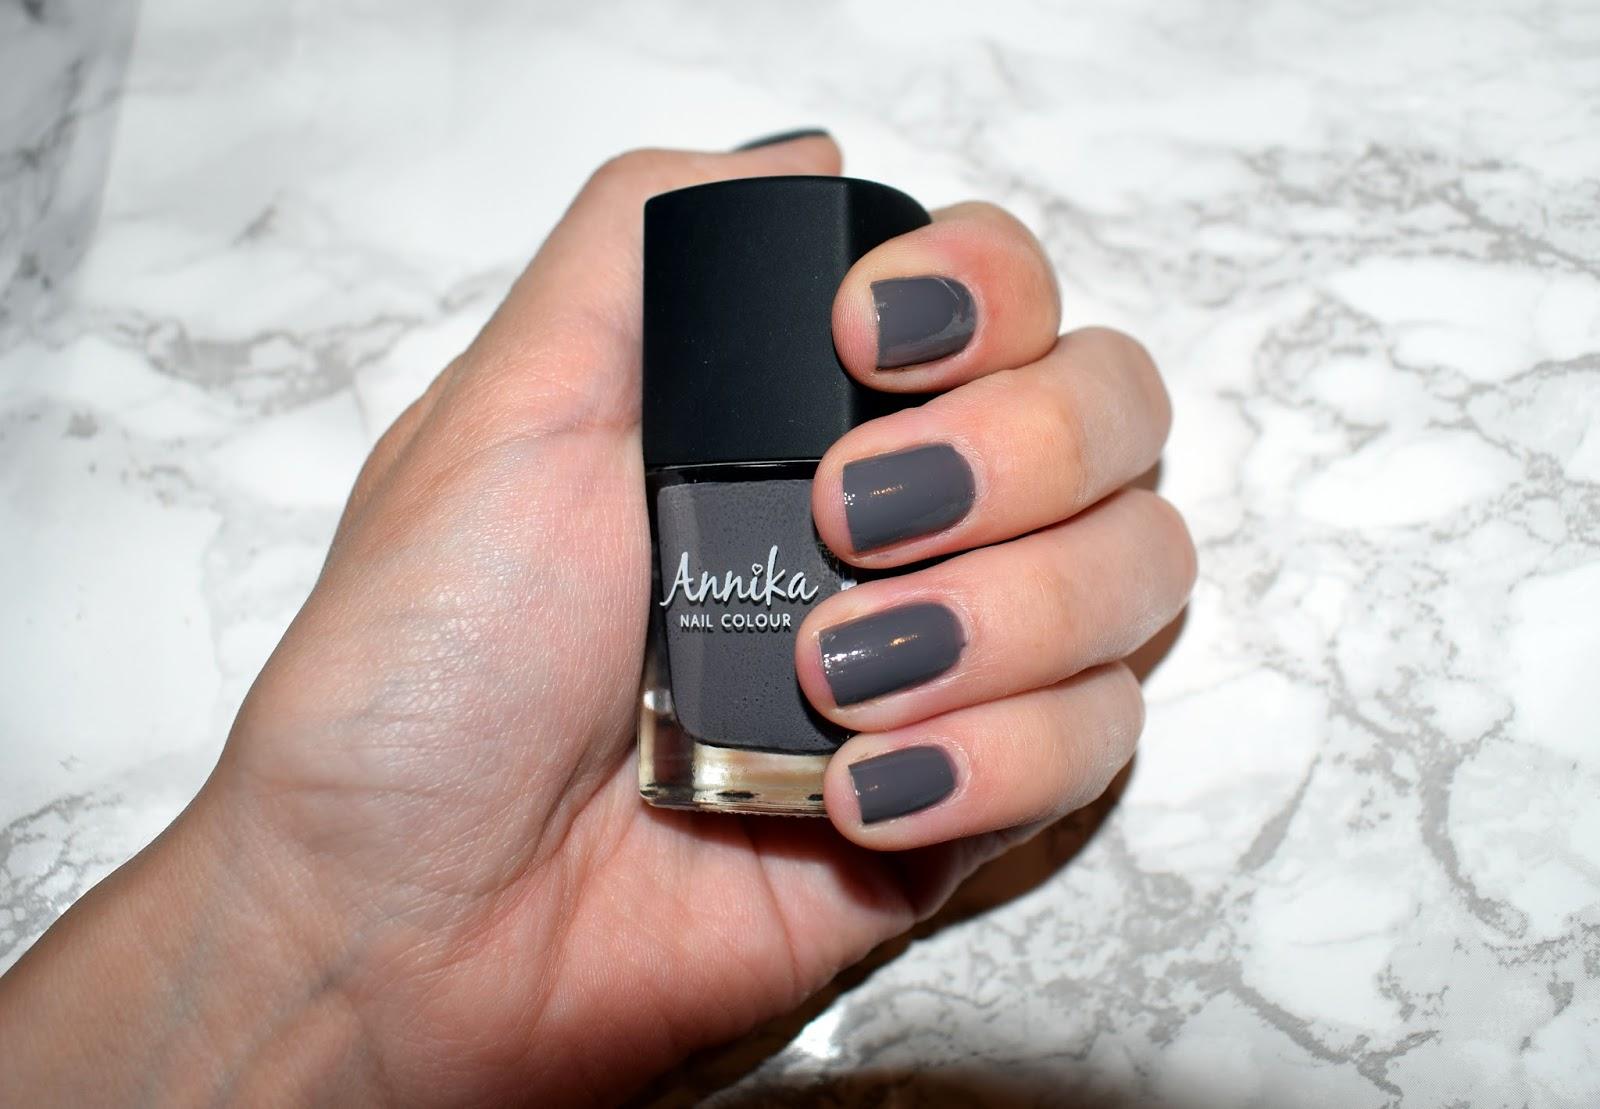 Review Annika Nail Colour  Lauren Loves Blog-6913